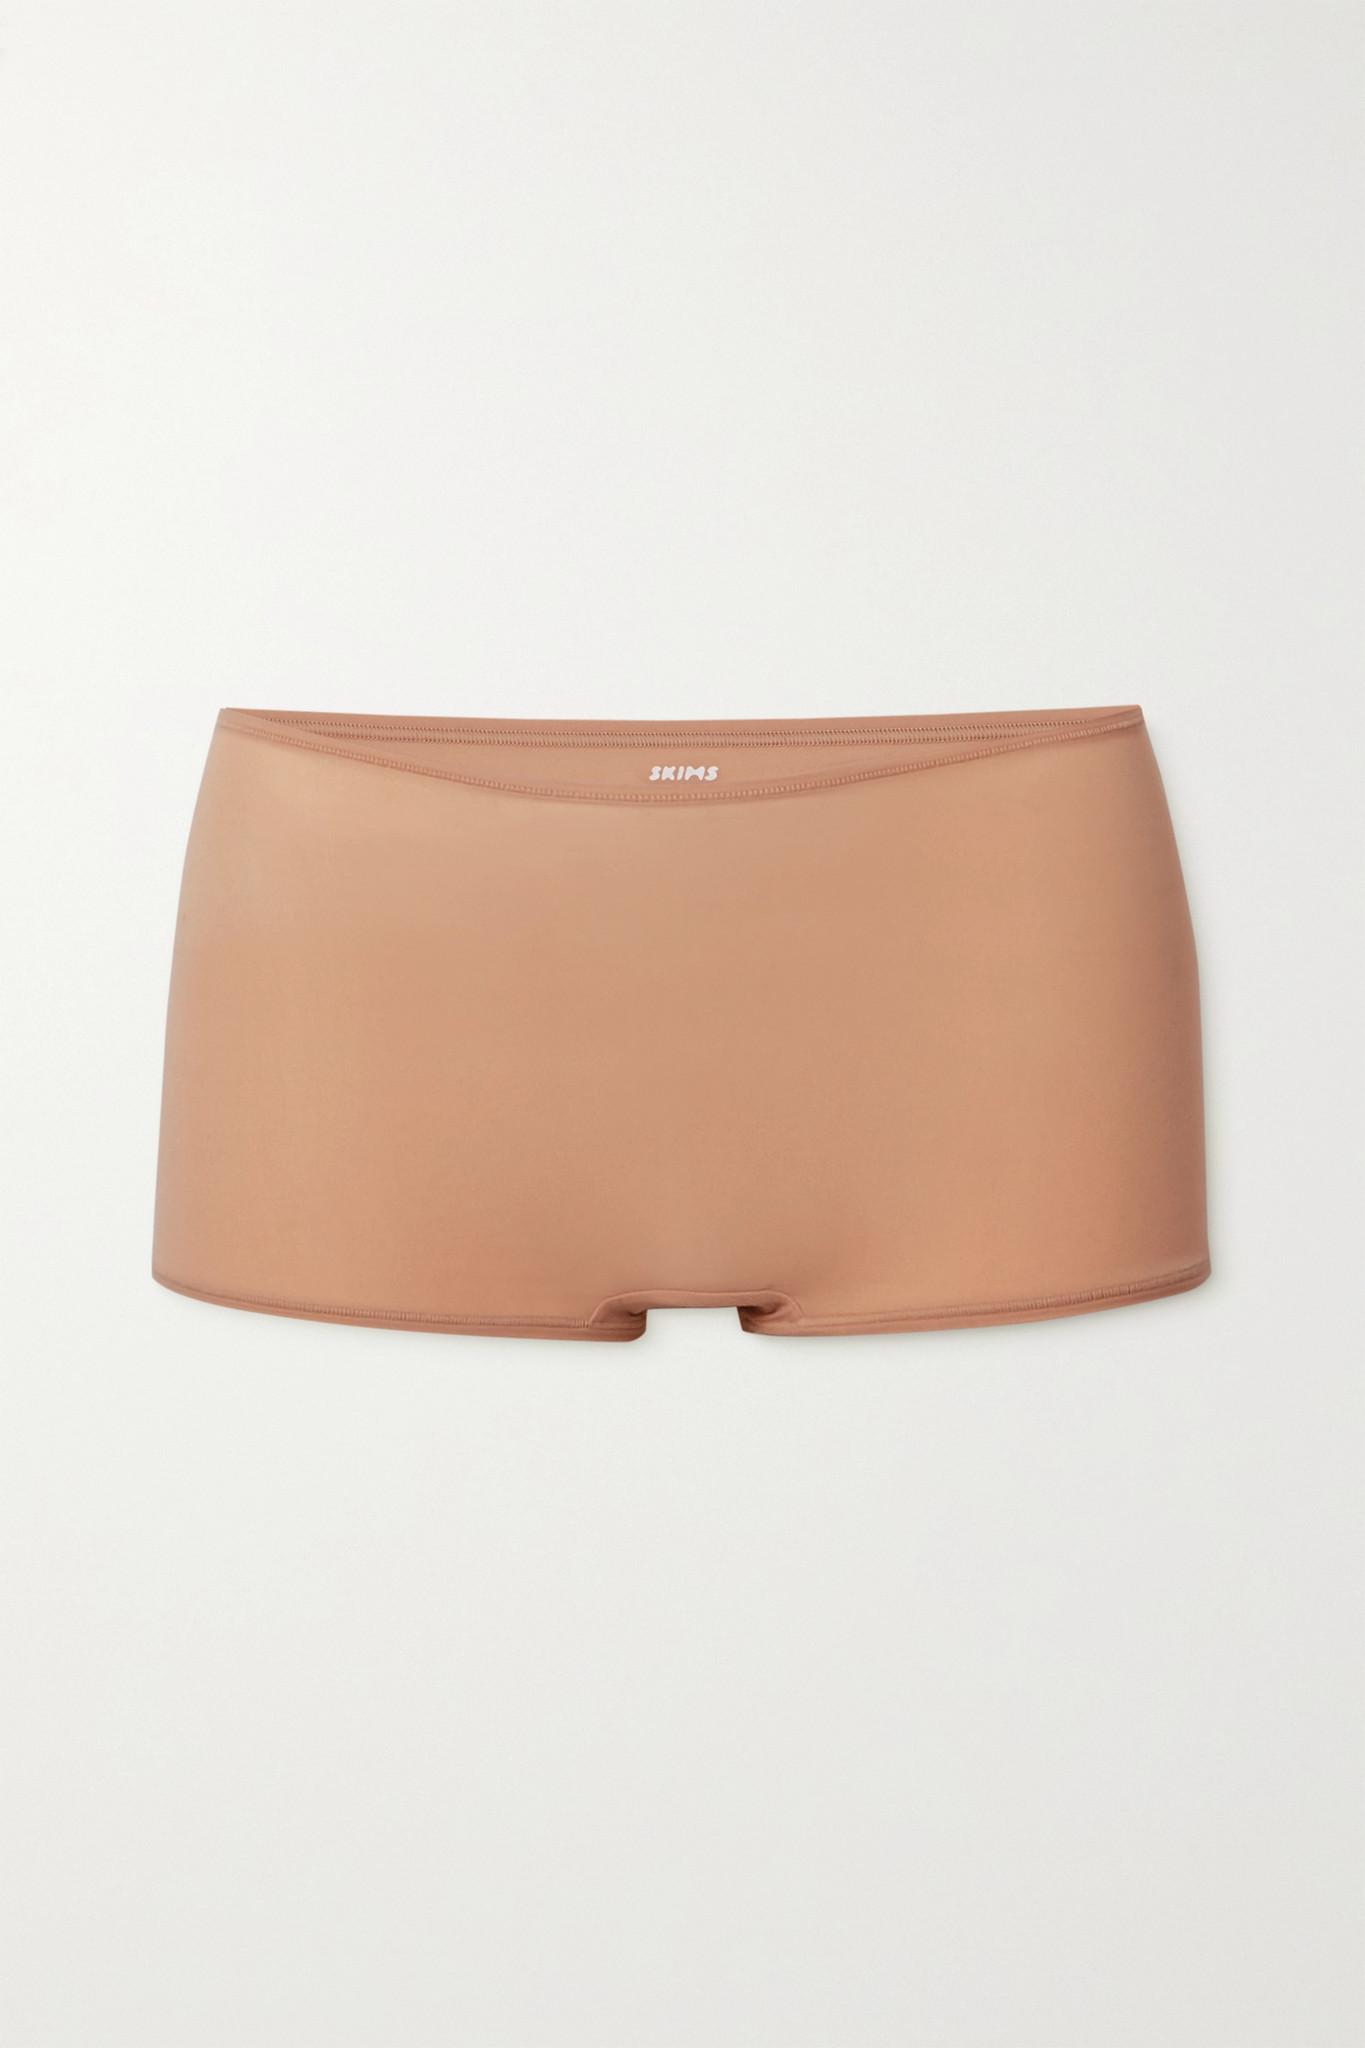 SKIMS - Fits Everybody Boy Shorts - Mica - Neutrals - 3XL